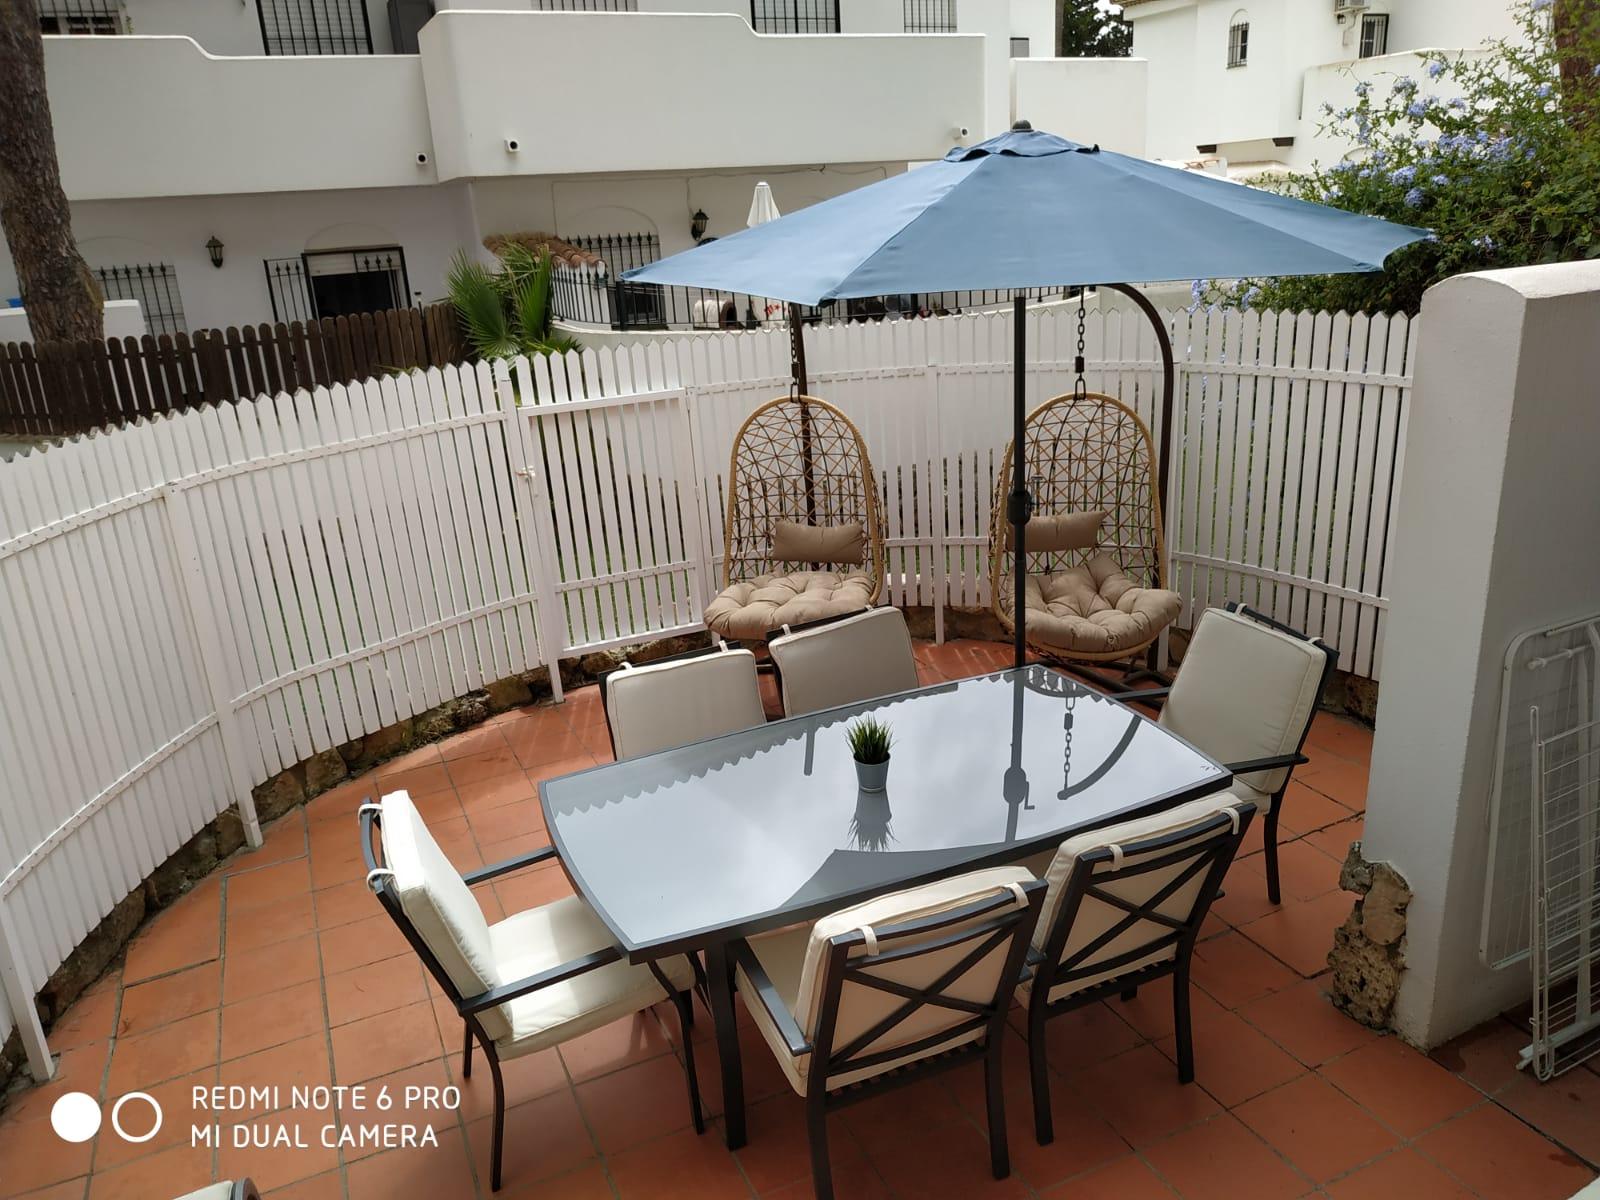 Pinar Atlántico,Apartment in Chiclana de la Frontera, Andalusia, Spain for 4 persons.....